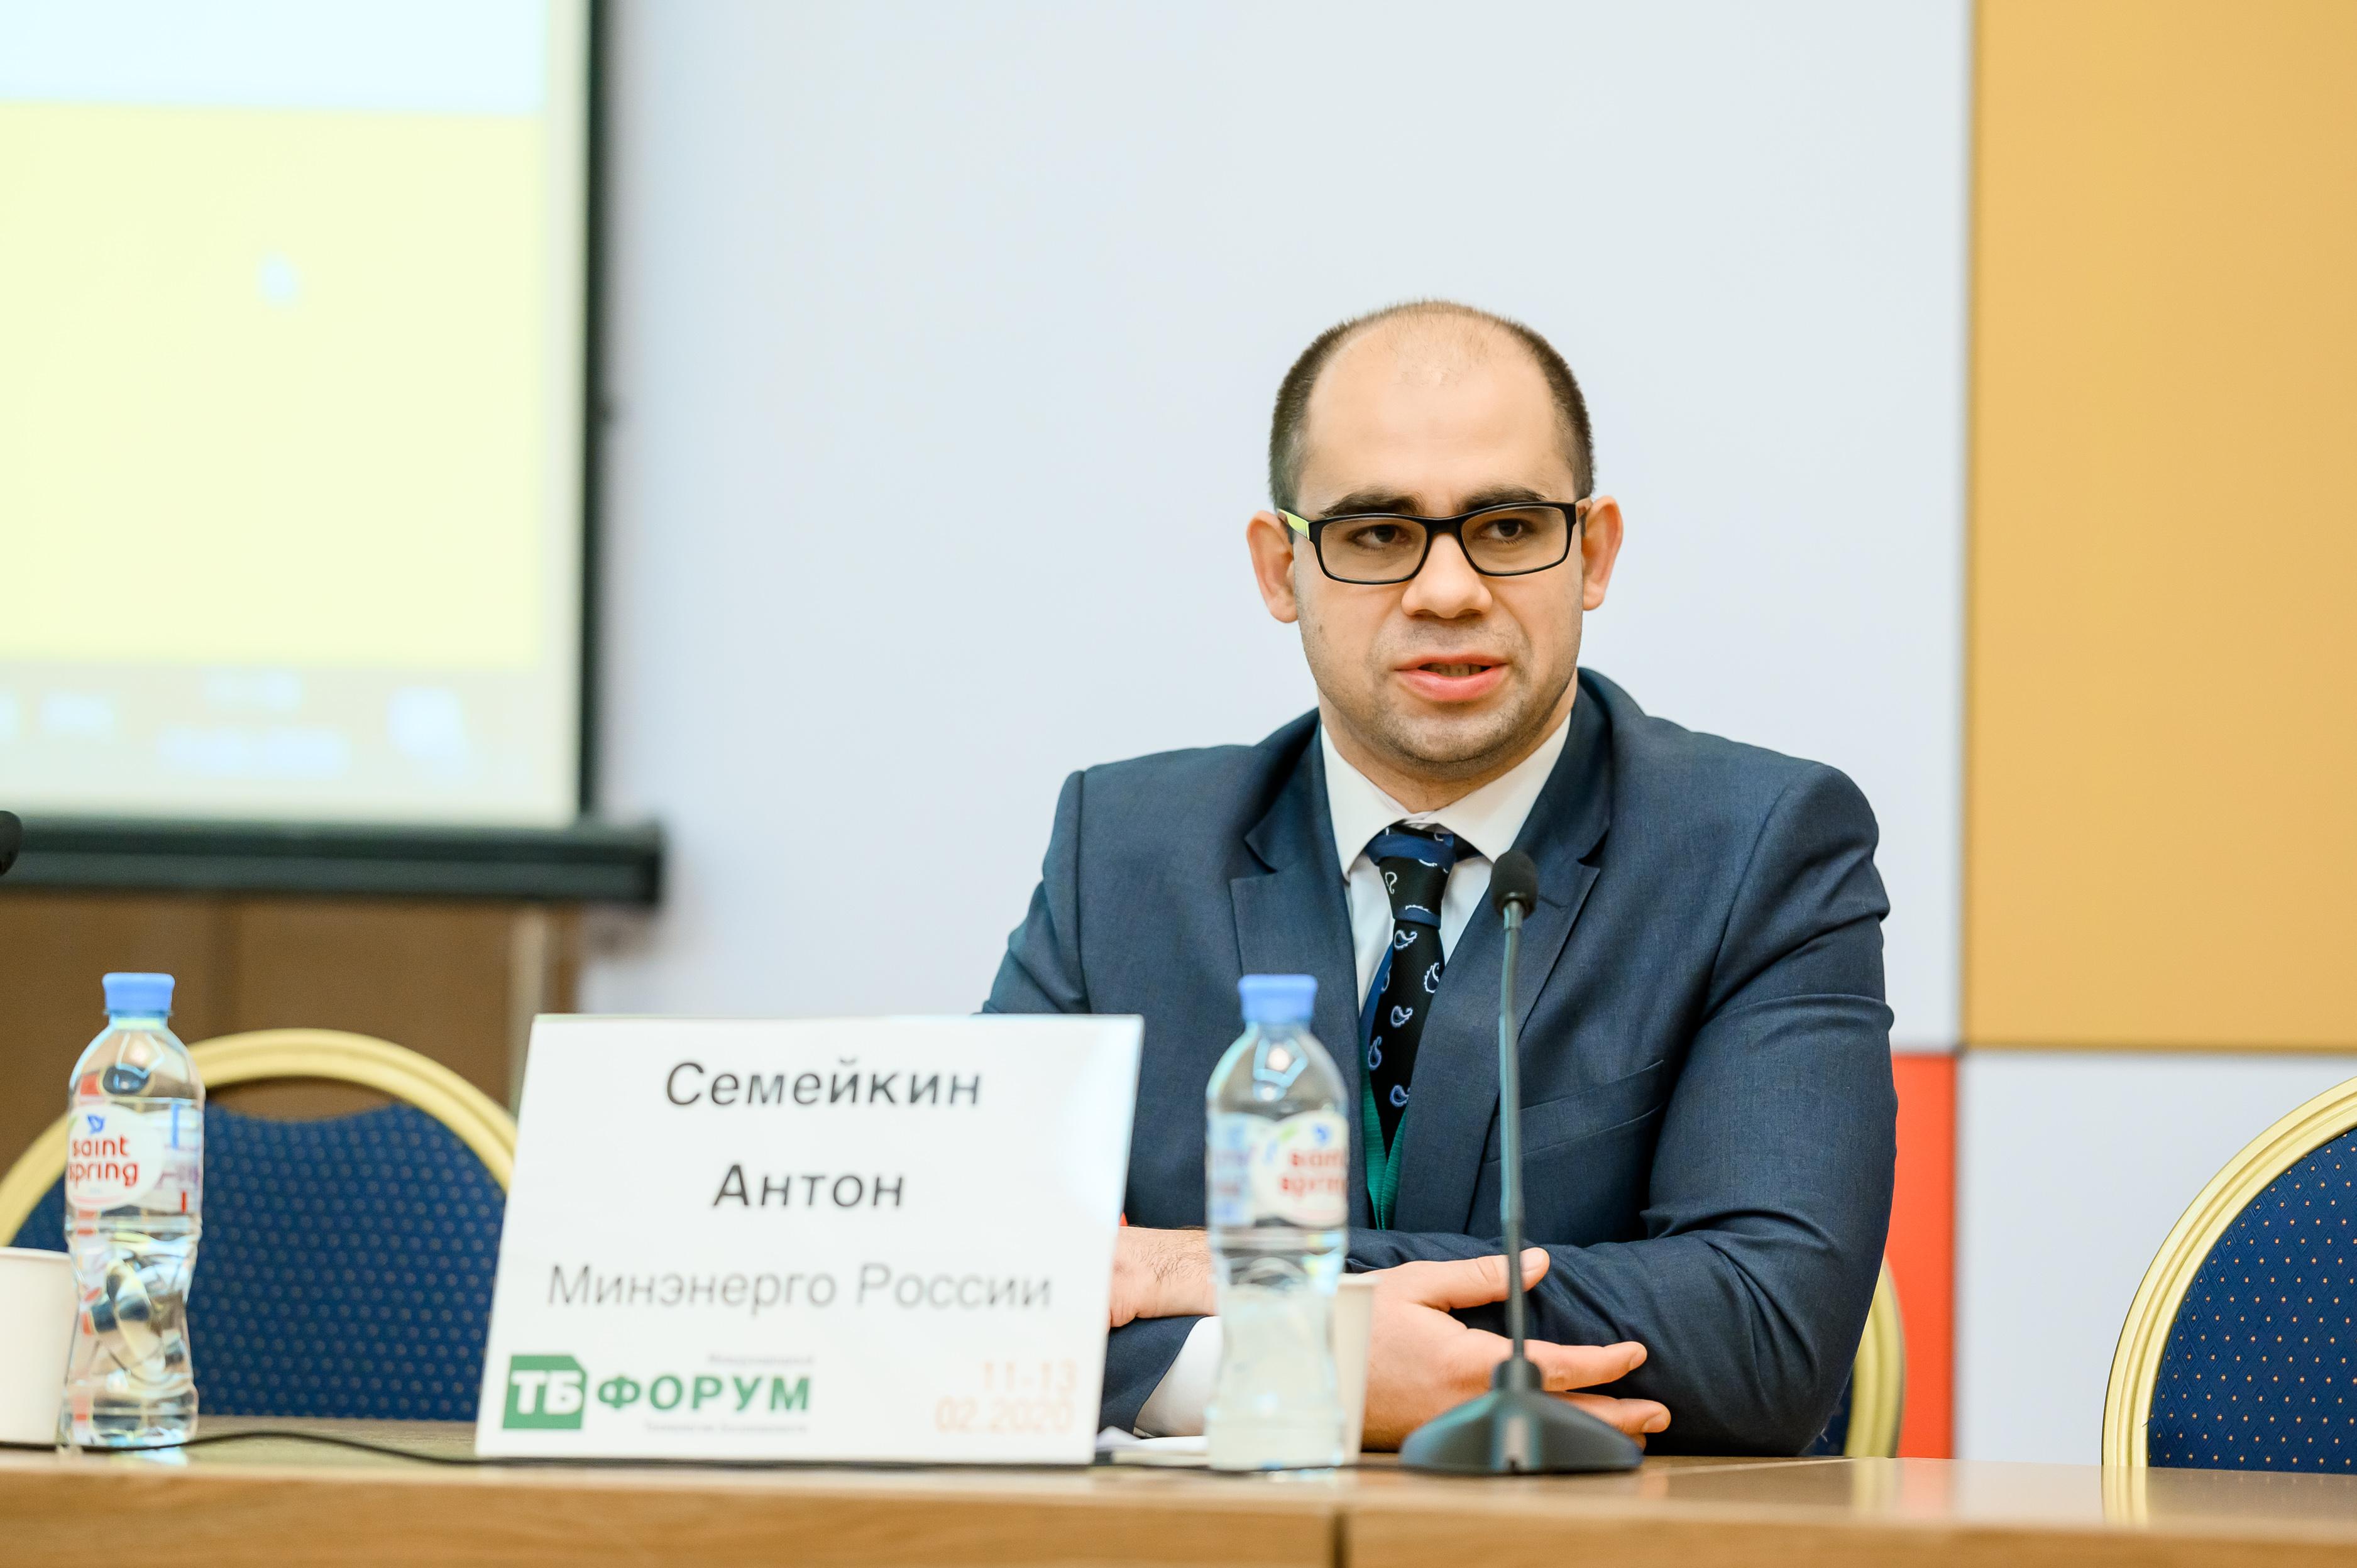 Антон Семейкин